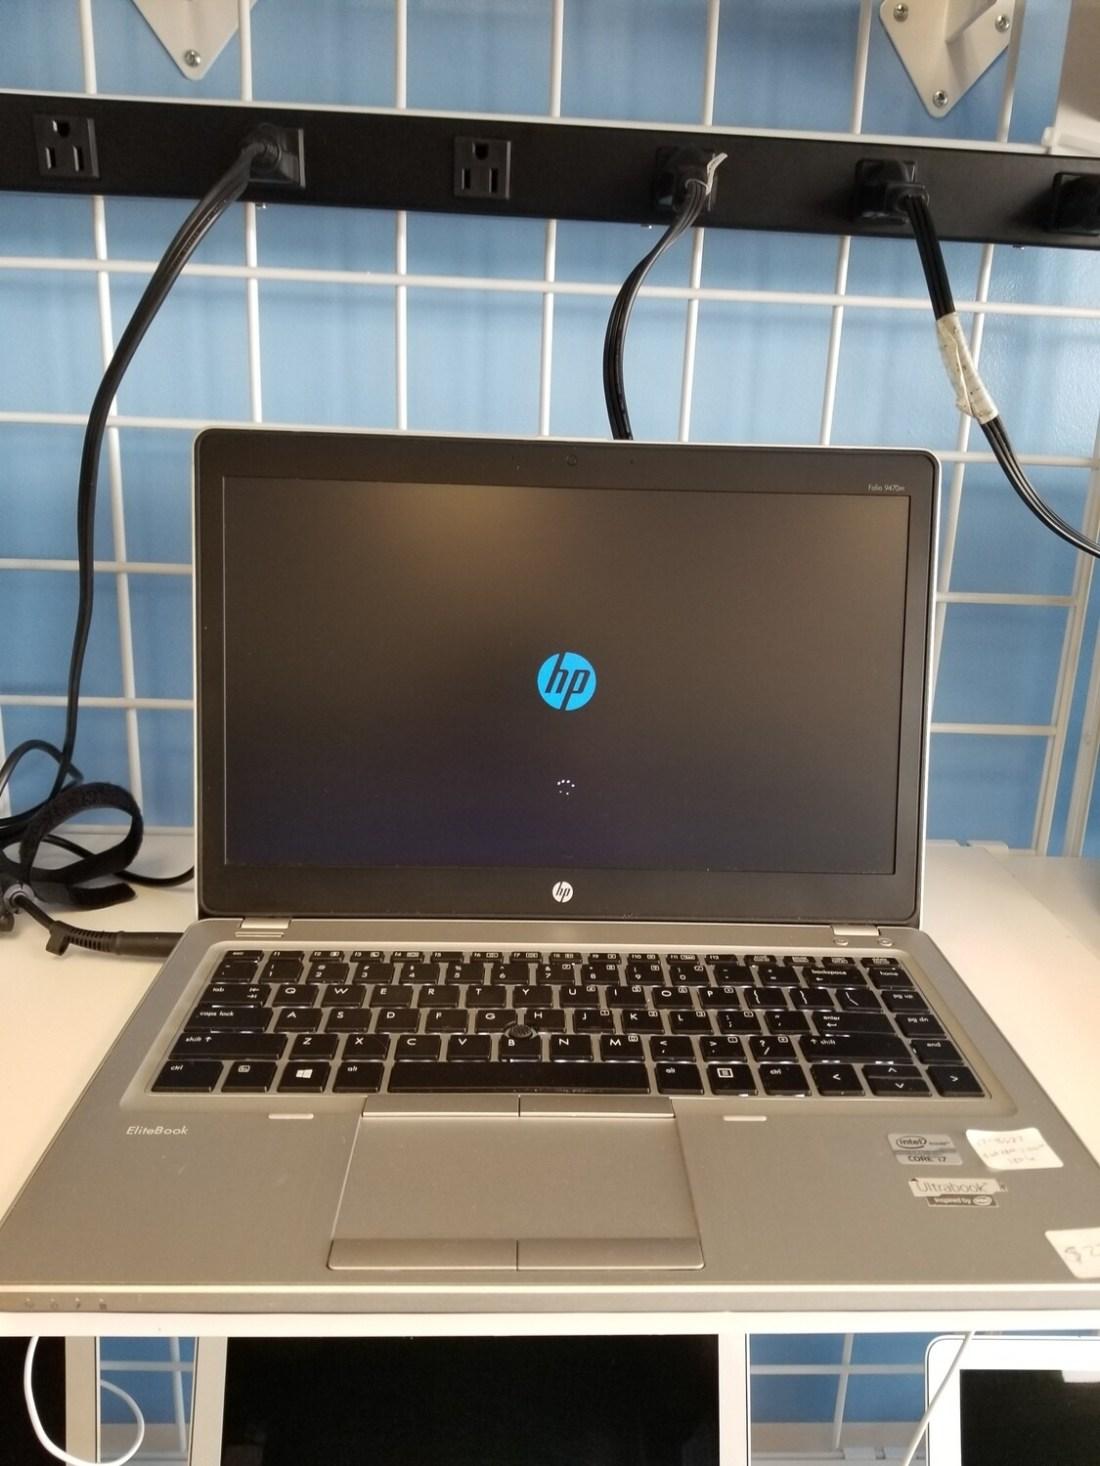 HP Folio 9470M Intel i7 8GB RAM 180GB SSD Windows 10